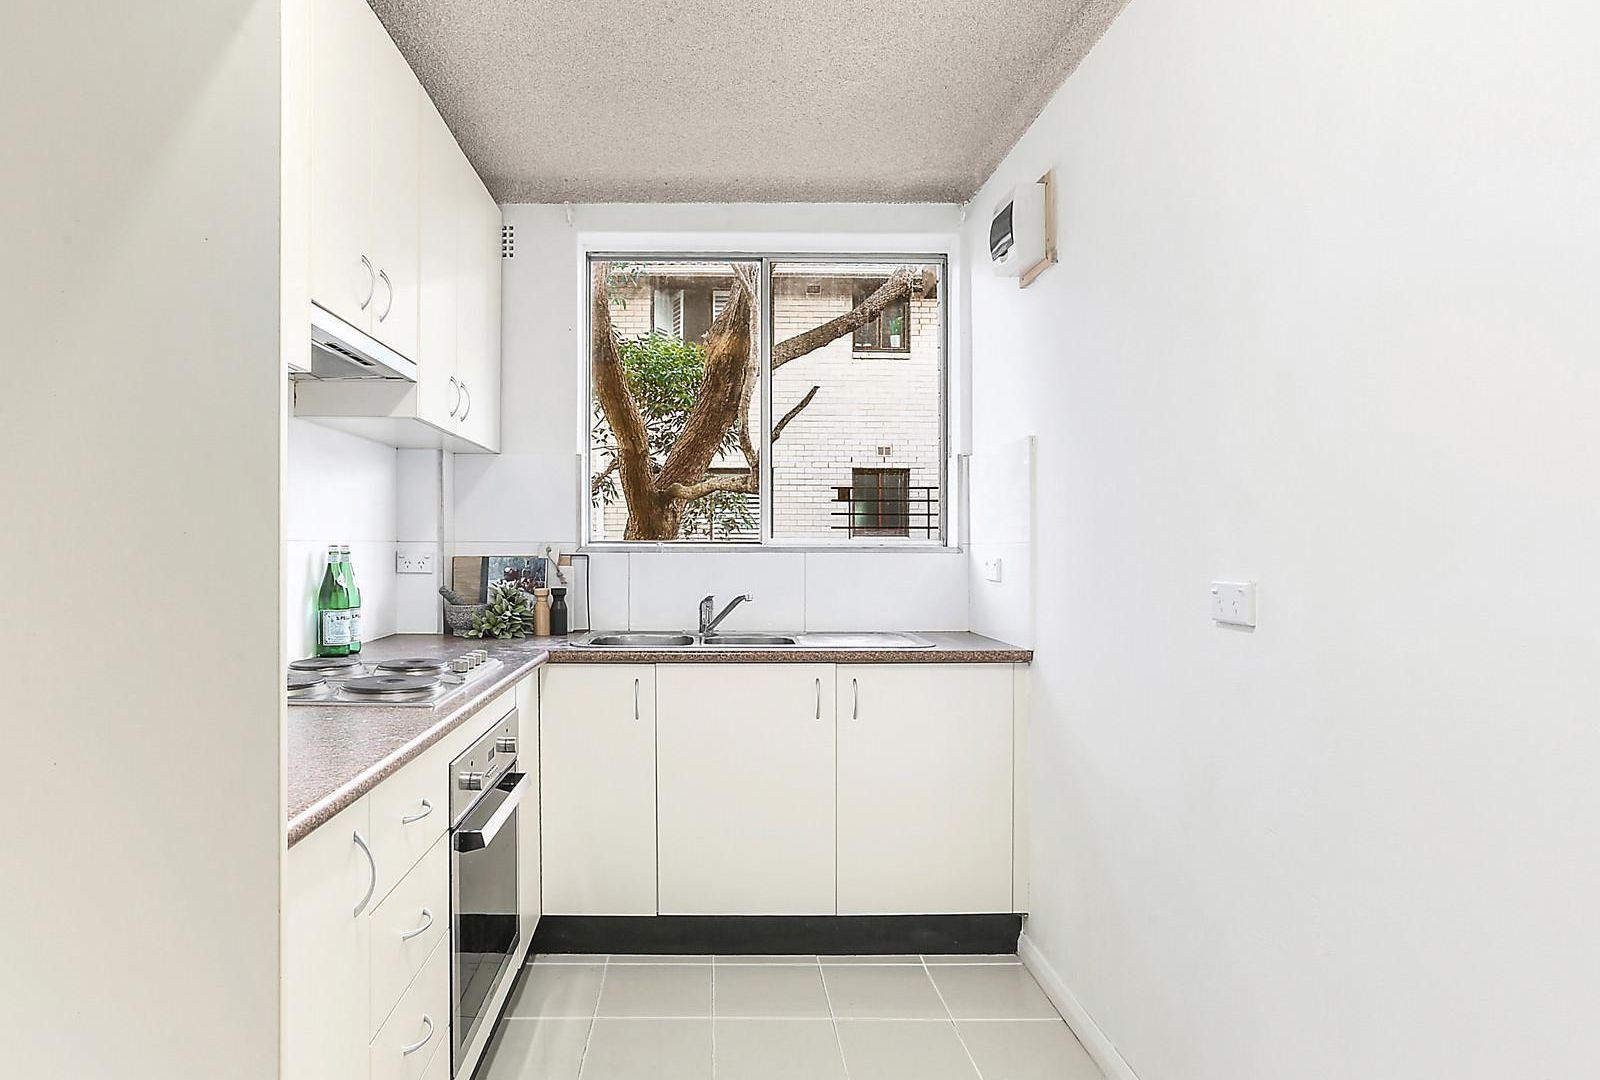 13/232 Rainbow Street, Coogee NSW 2034, Image 2